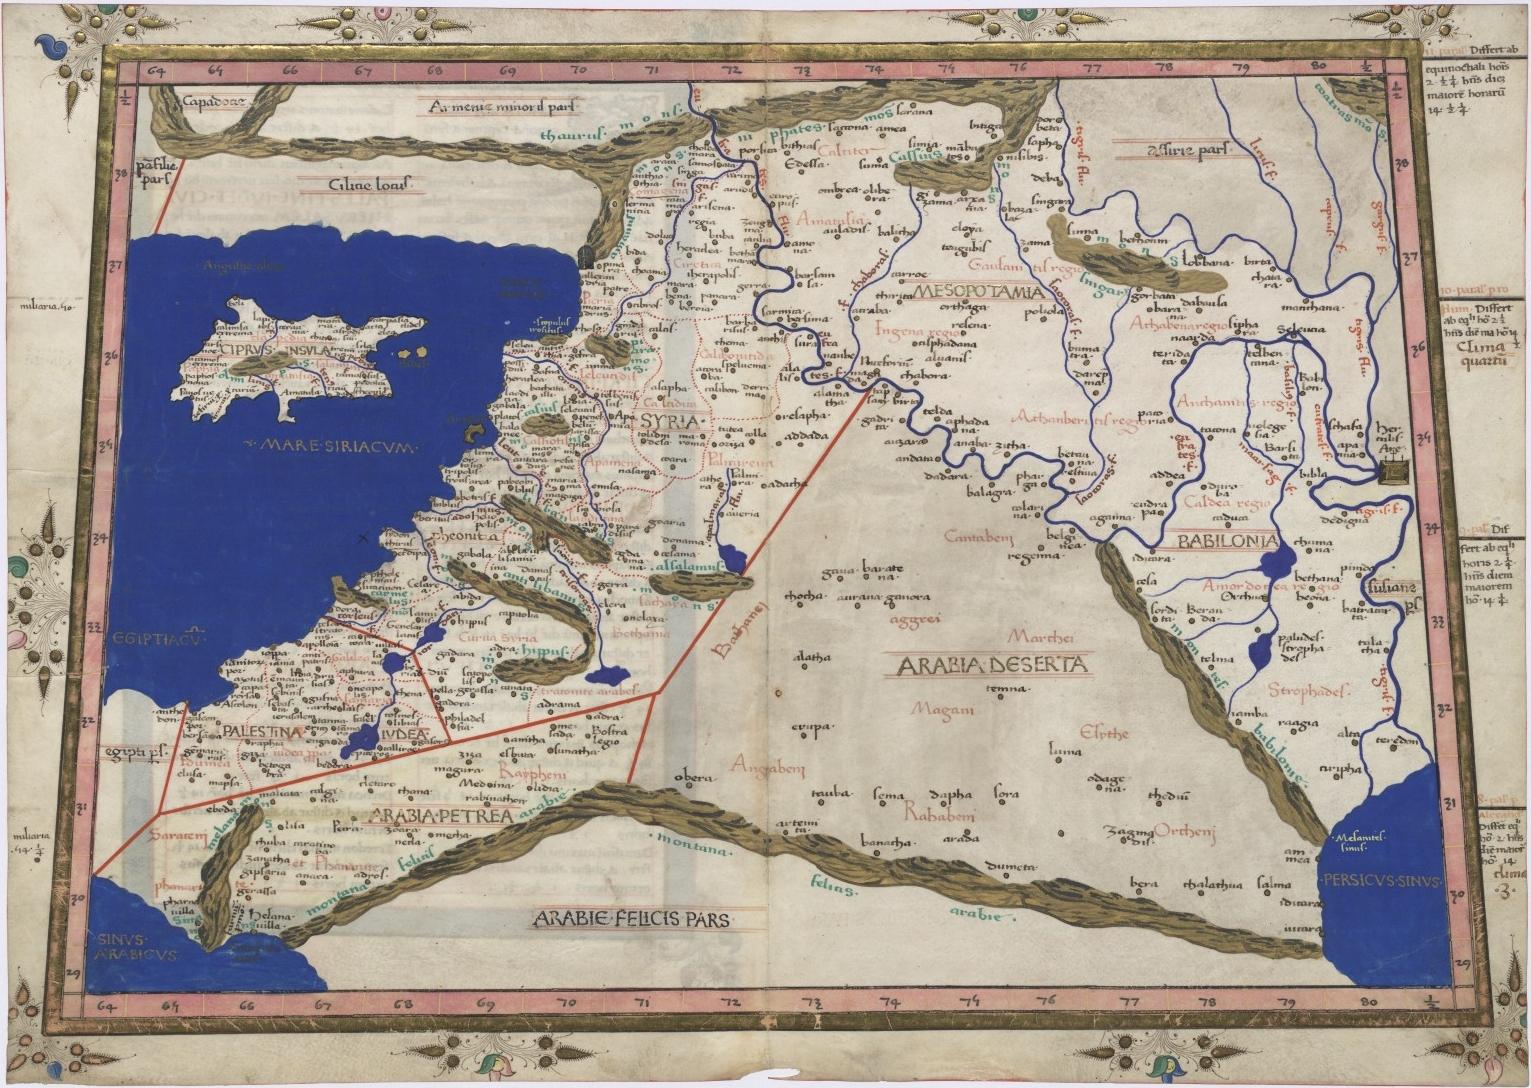 Ptolemy Geographia Book 6